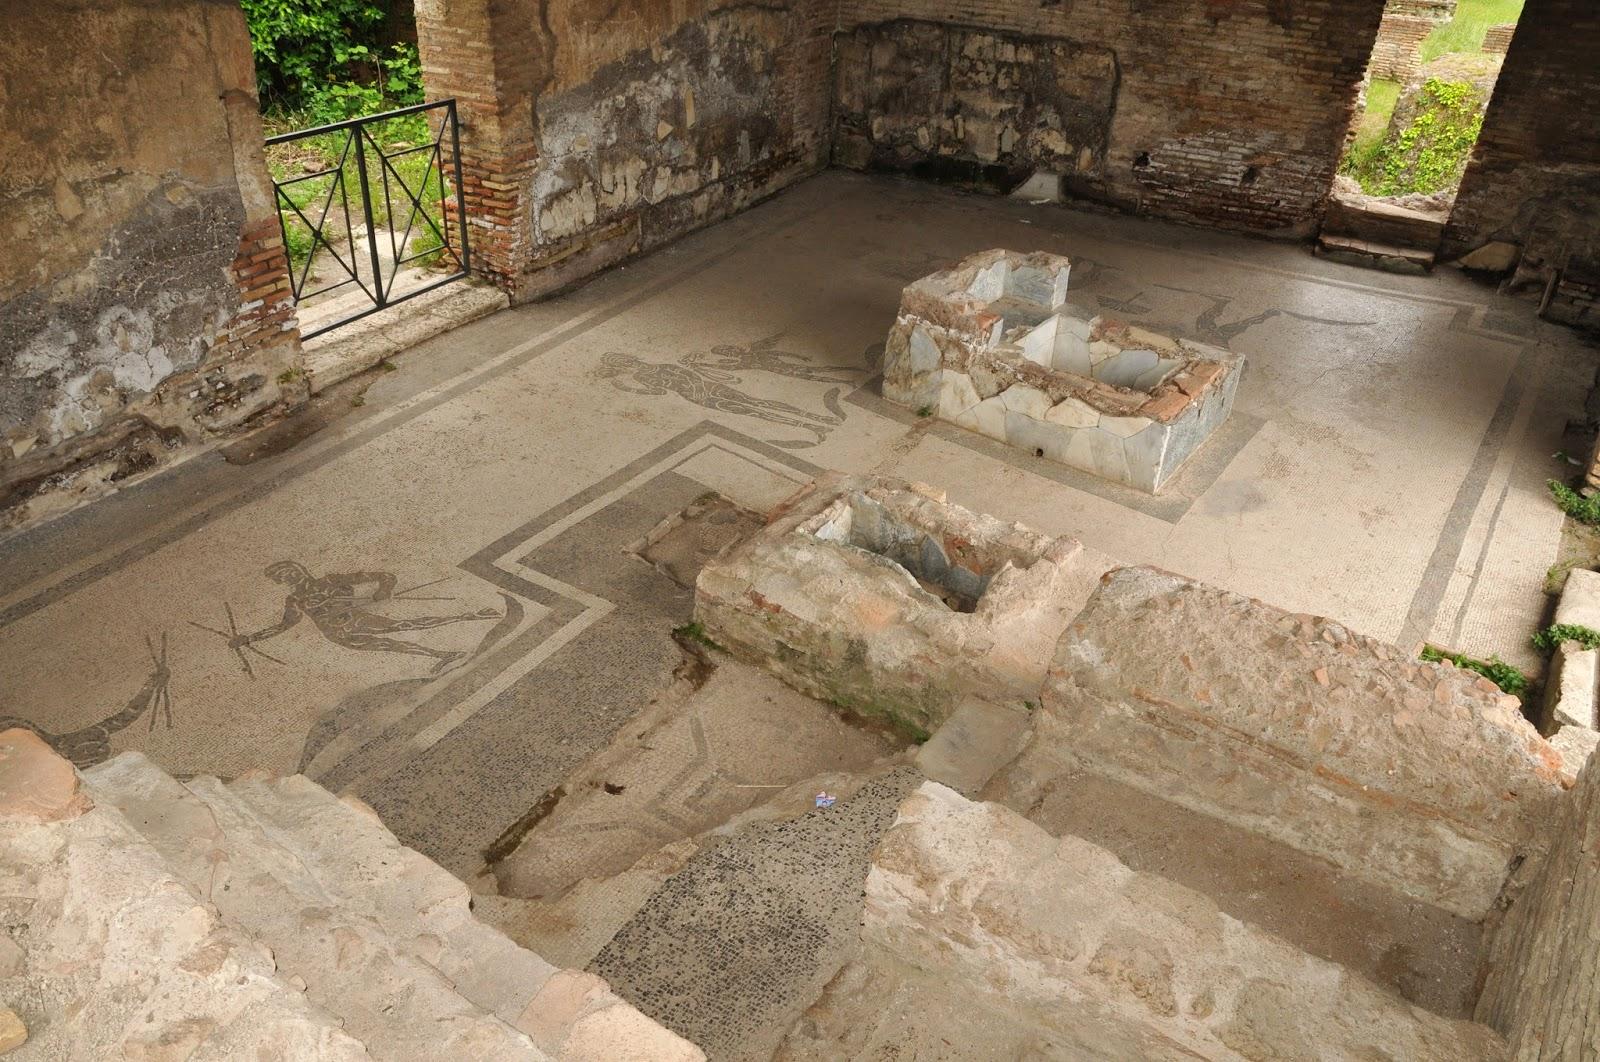 Siti archeologici statali: cosa vedere a Ostia Antica e Pompei